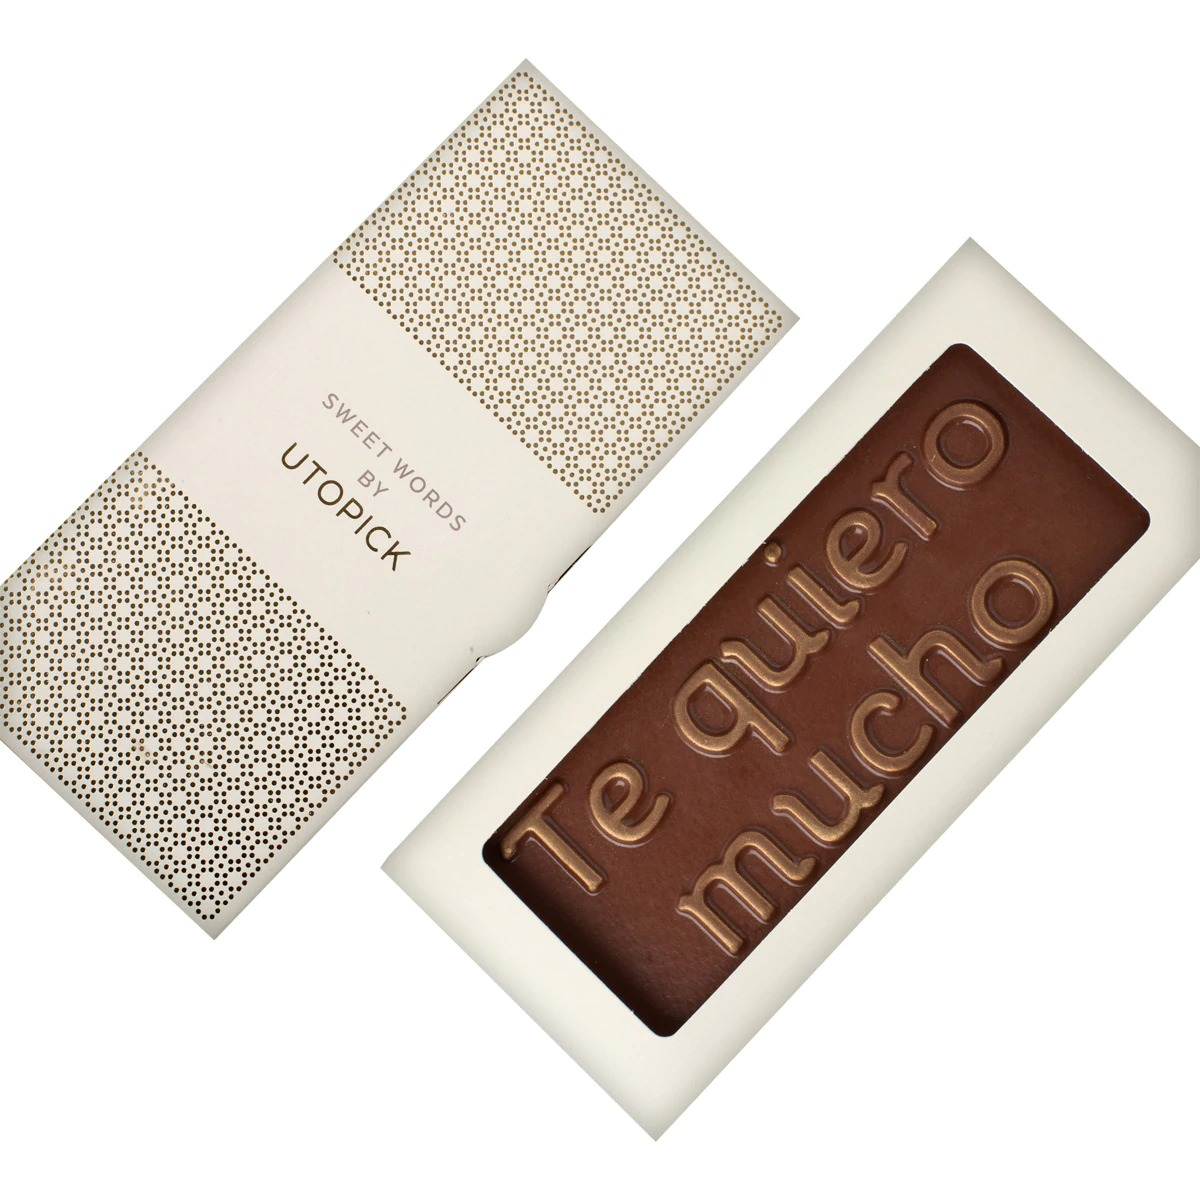 "Tableta de chocolate con leche Sweet Words ""Te Quiero Mucho"" Utopick"